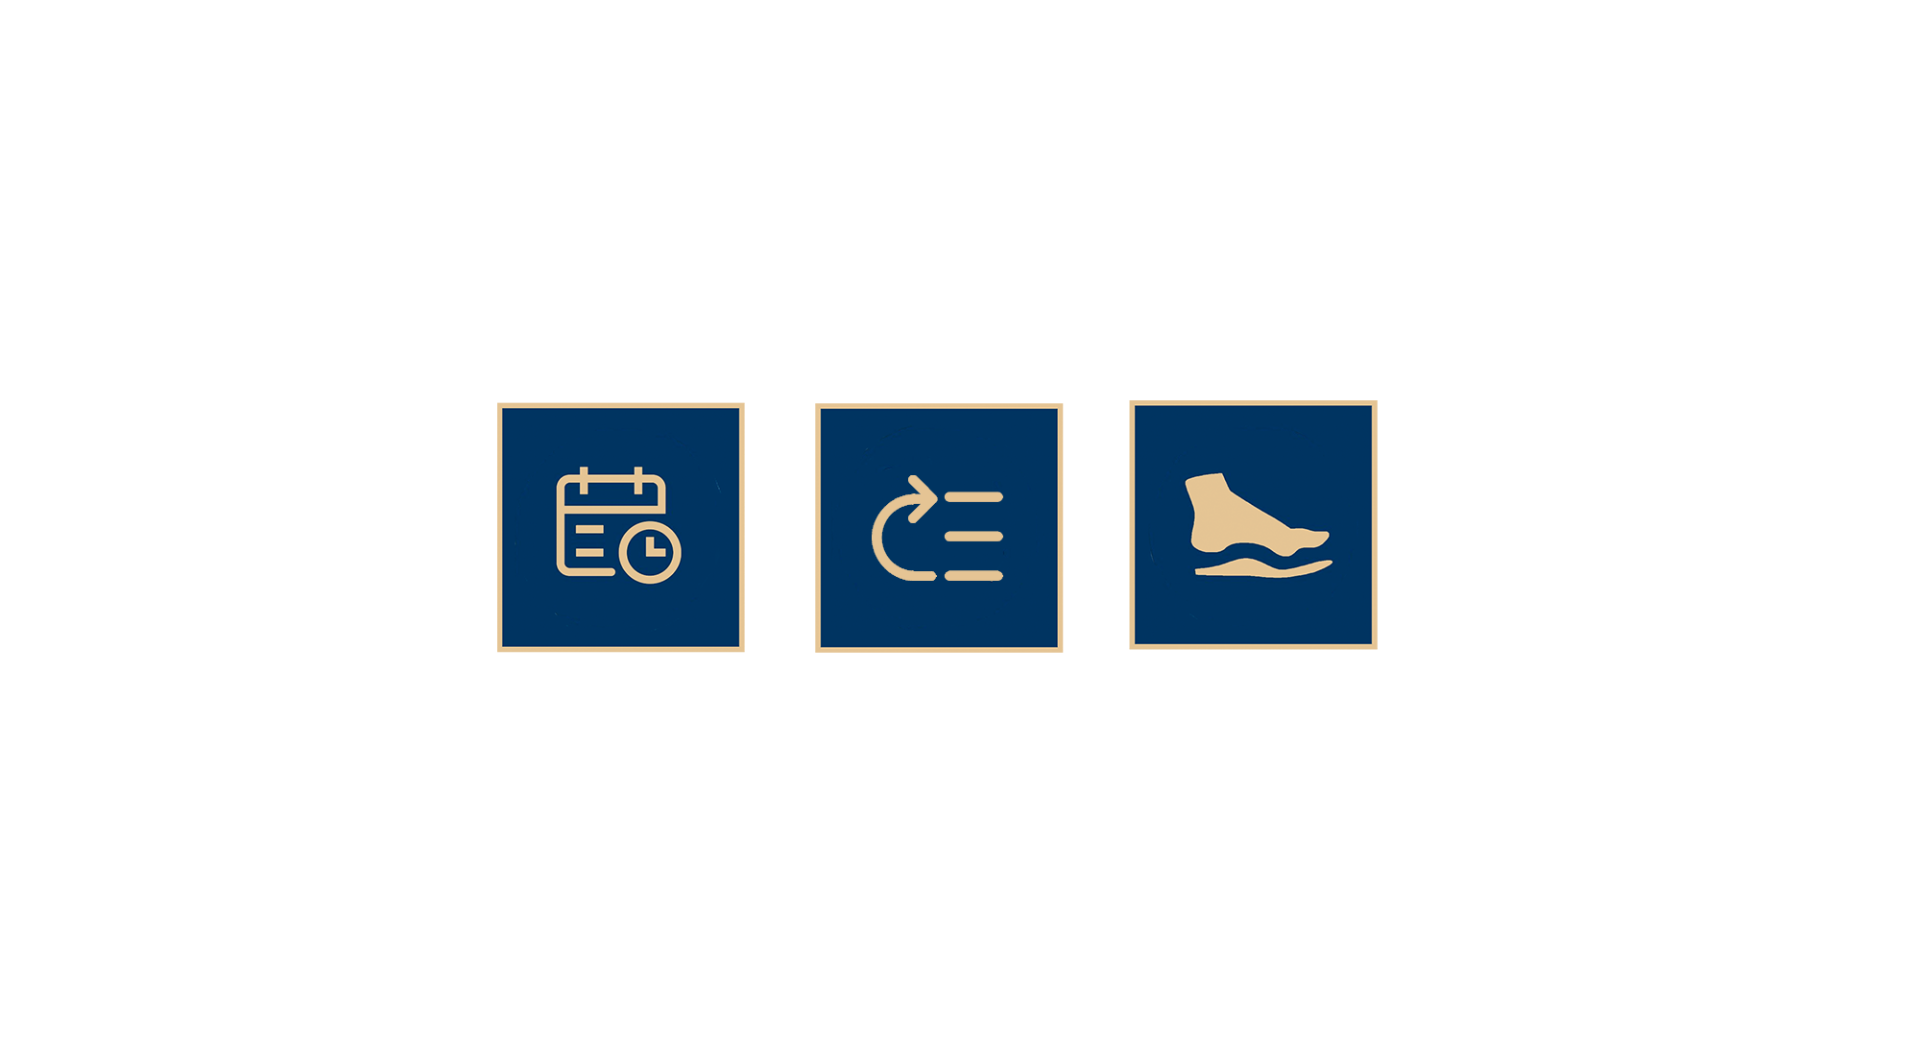 genbestil-fodindlaeg-online-kaiser-sport-layer